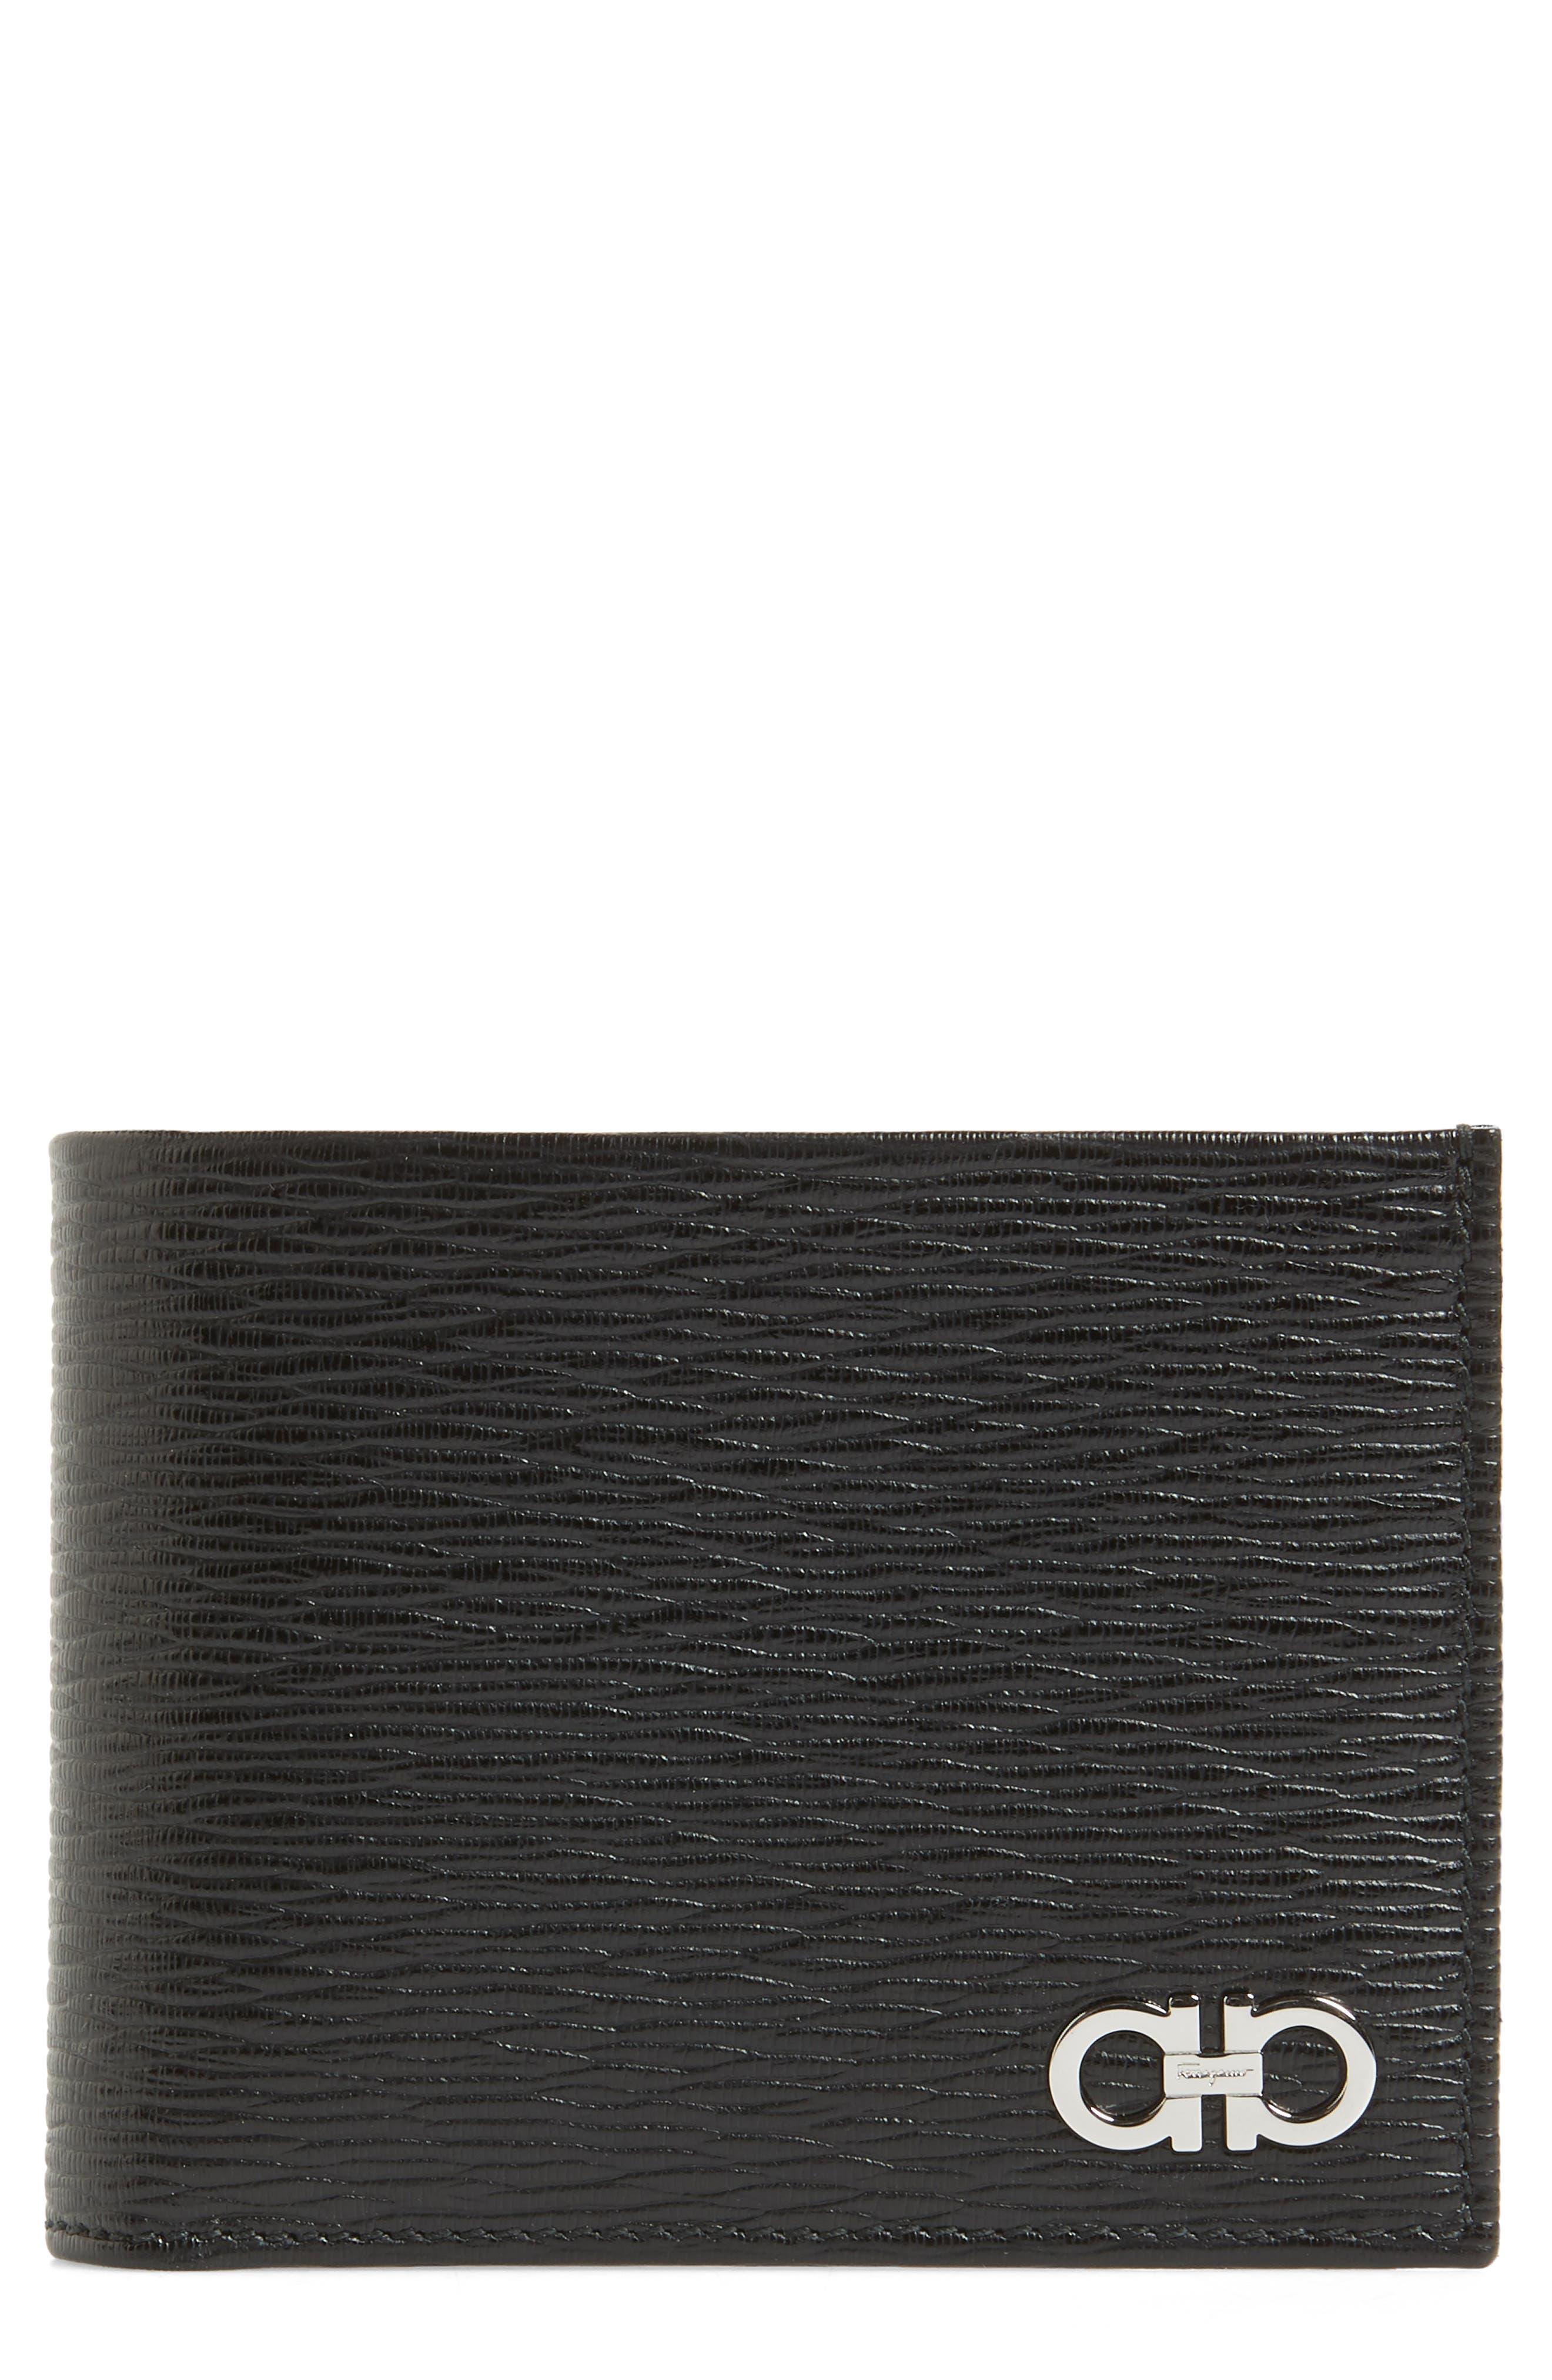 SALVATORE FERRAGAMO Revival Leather Card Case, Main, color, BLACK